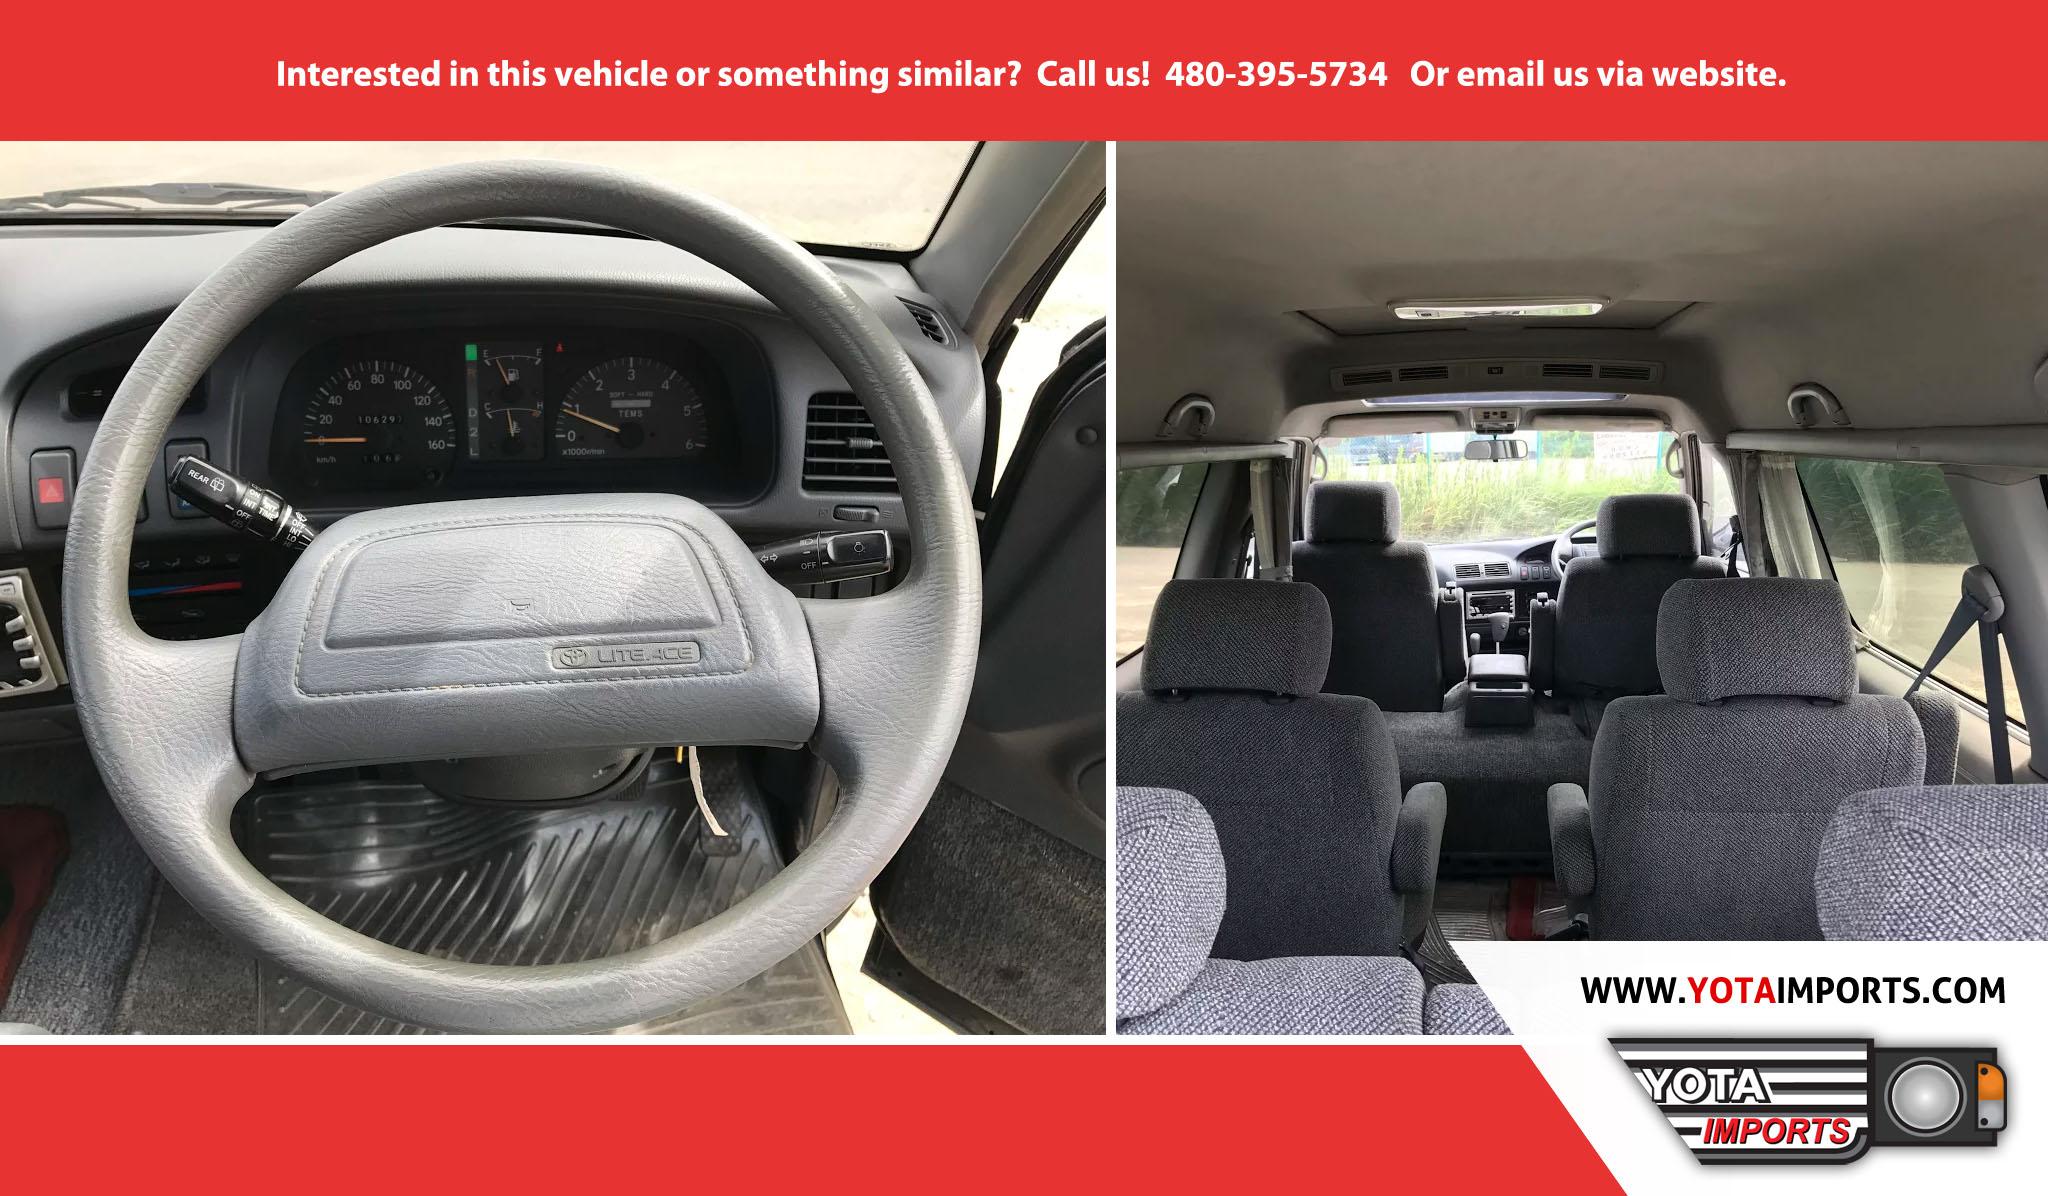 Toyota Pay By Phone >> 1992 Toyota Liteace Wagon / Van – Yota Imports